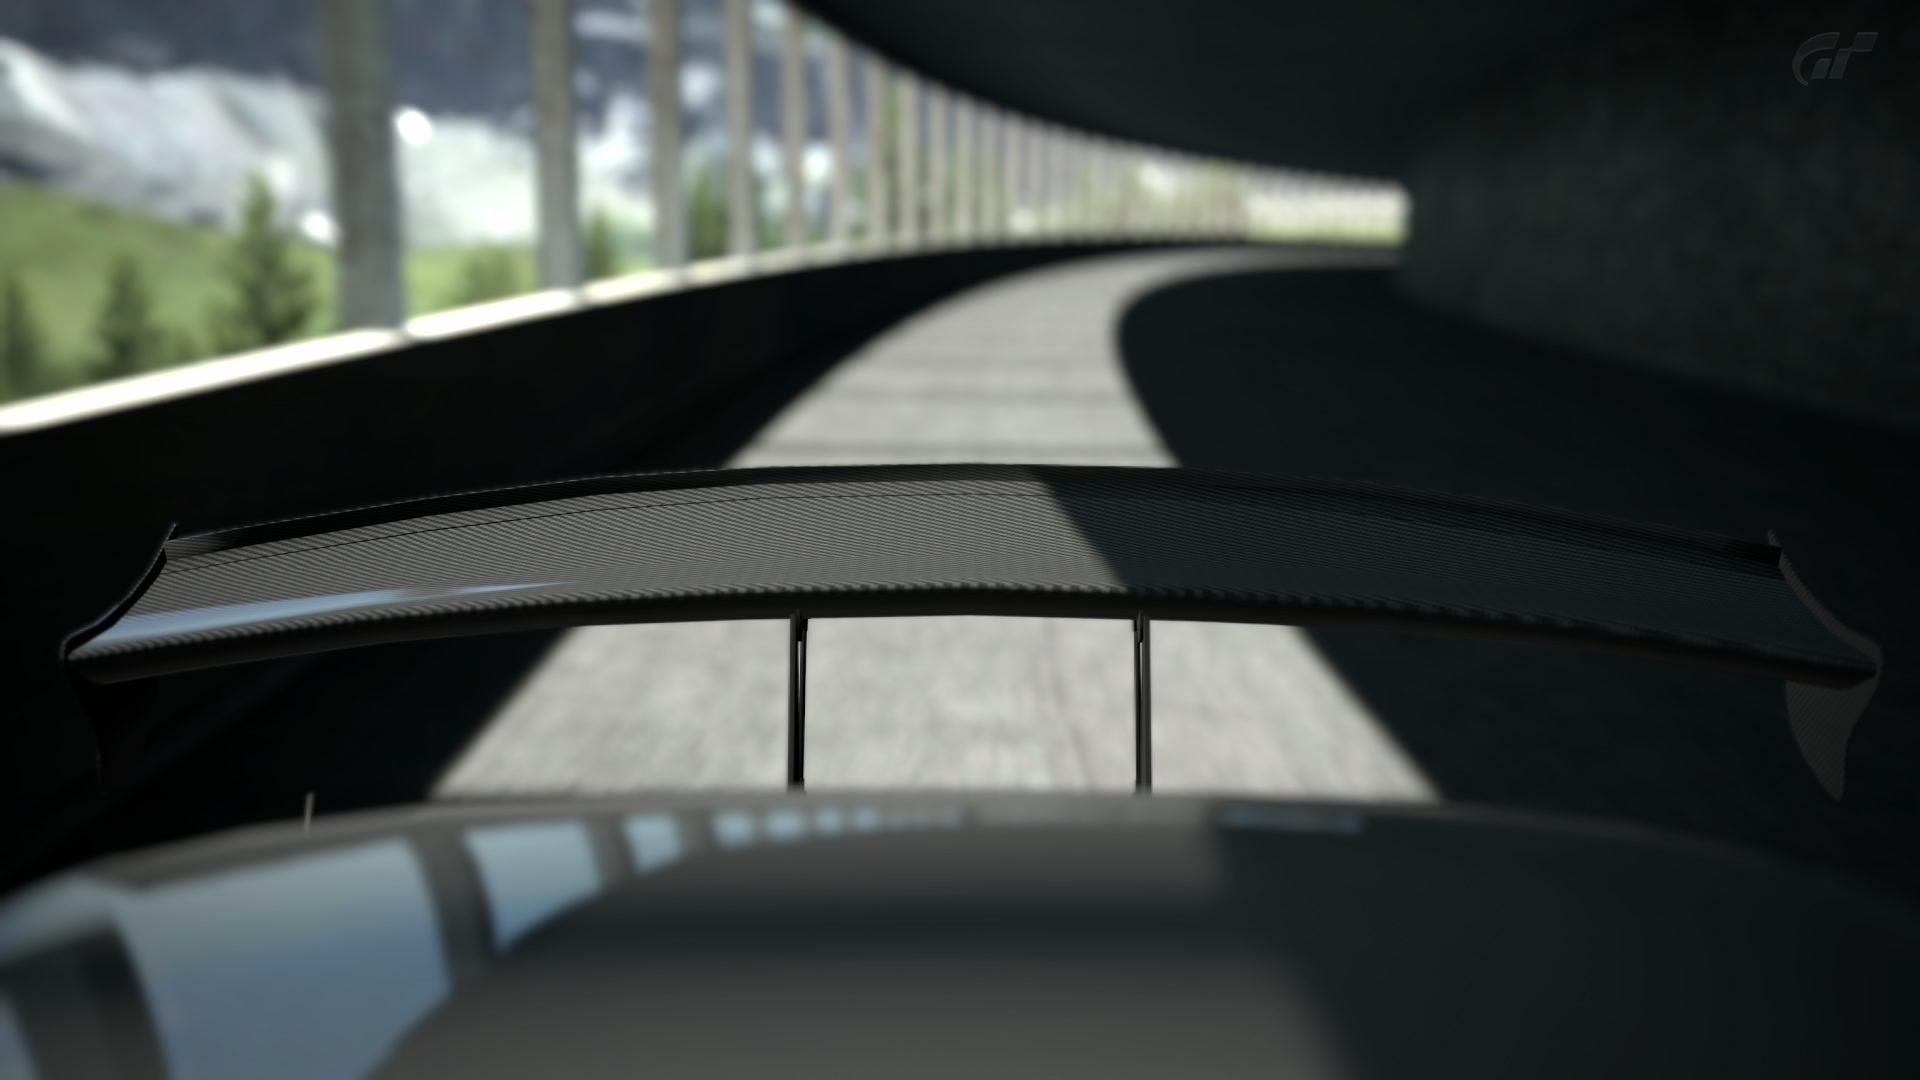 Eiger Nordwand - Circuito corto_9.jpg